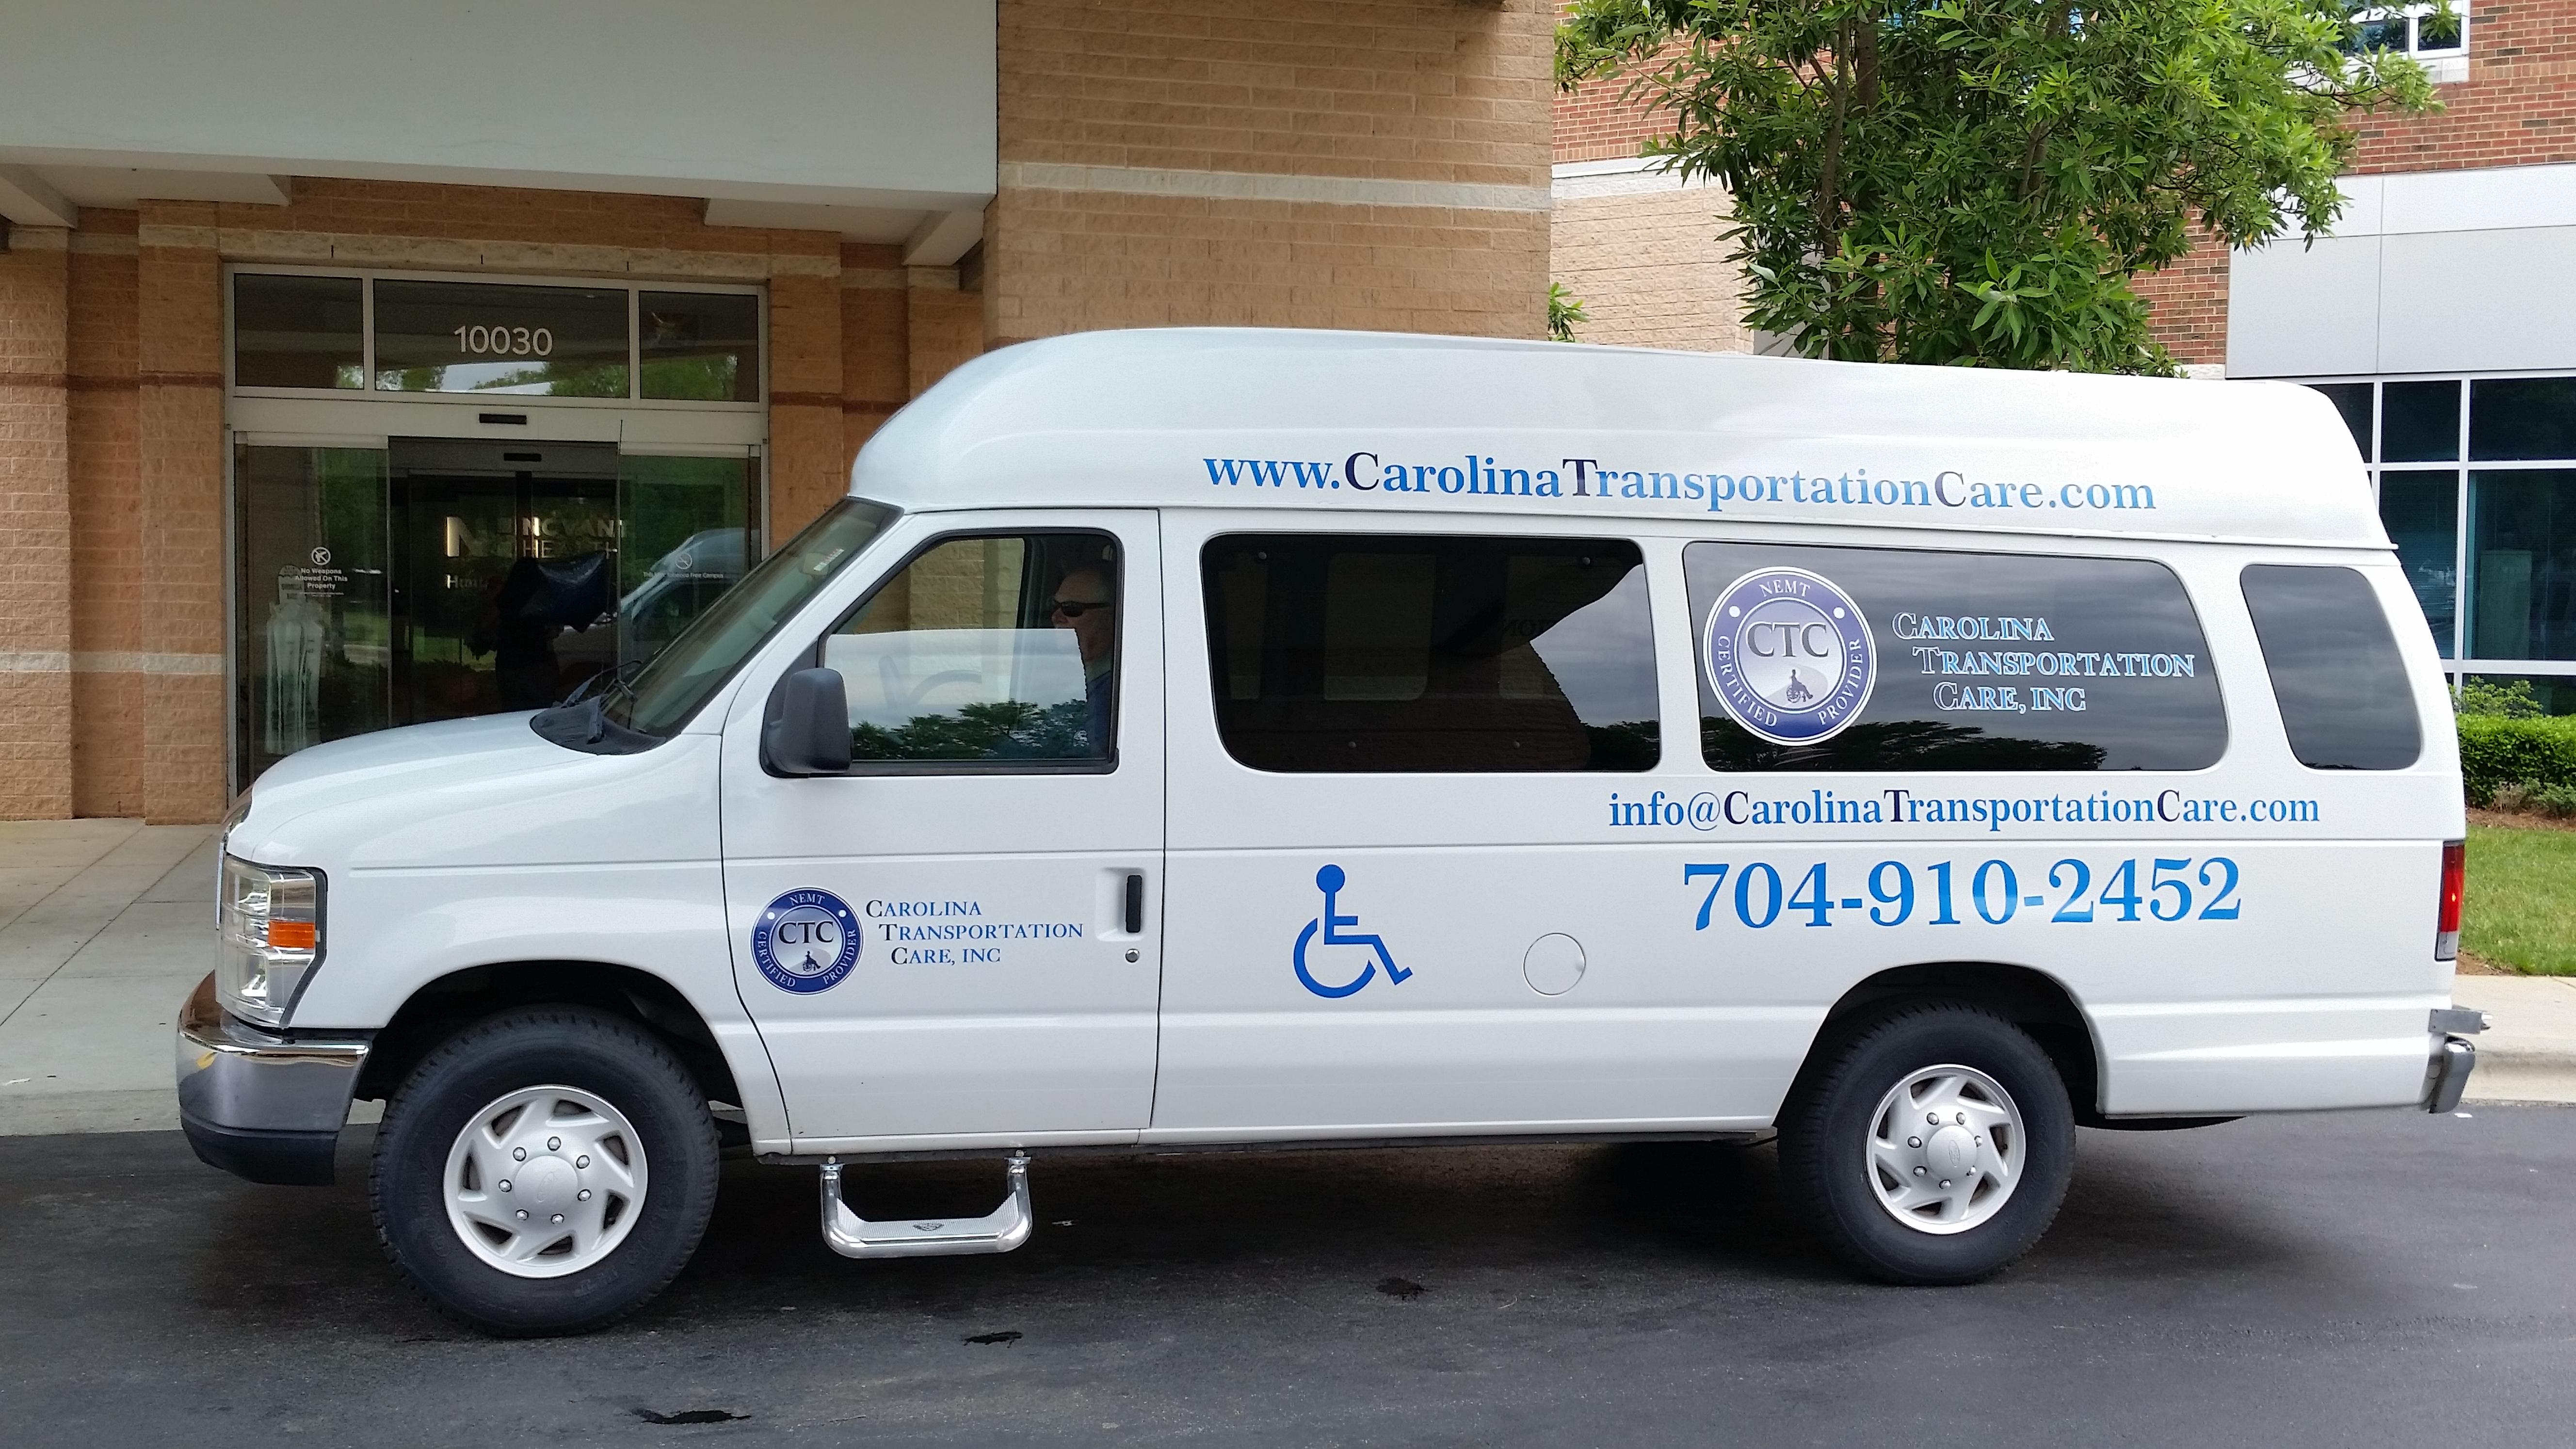 Carolina Transportation Care, Inc. image 2